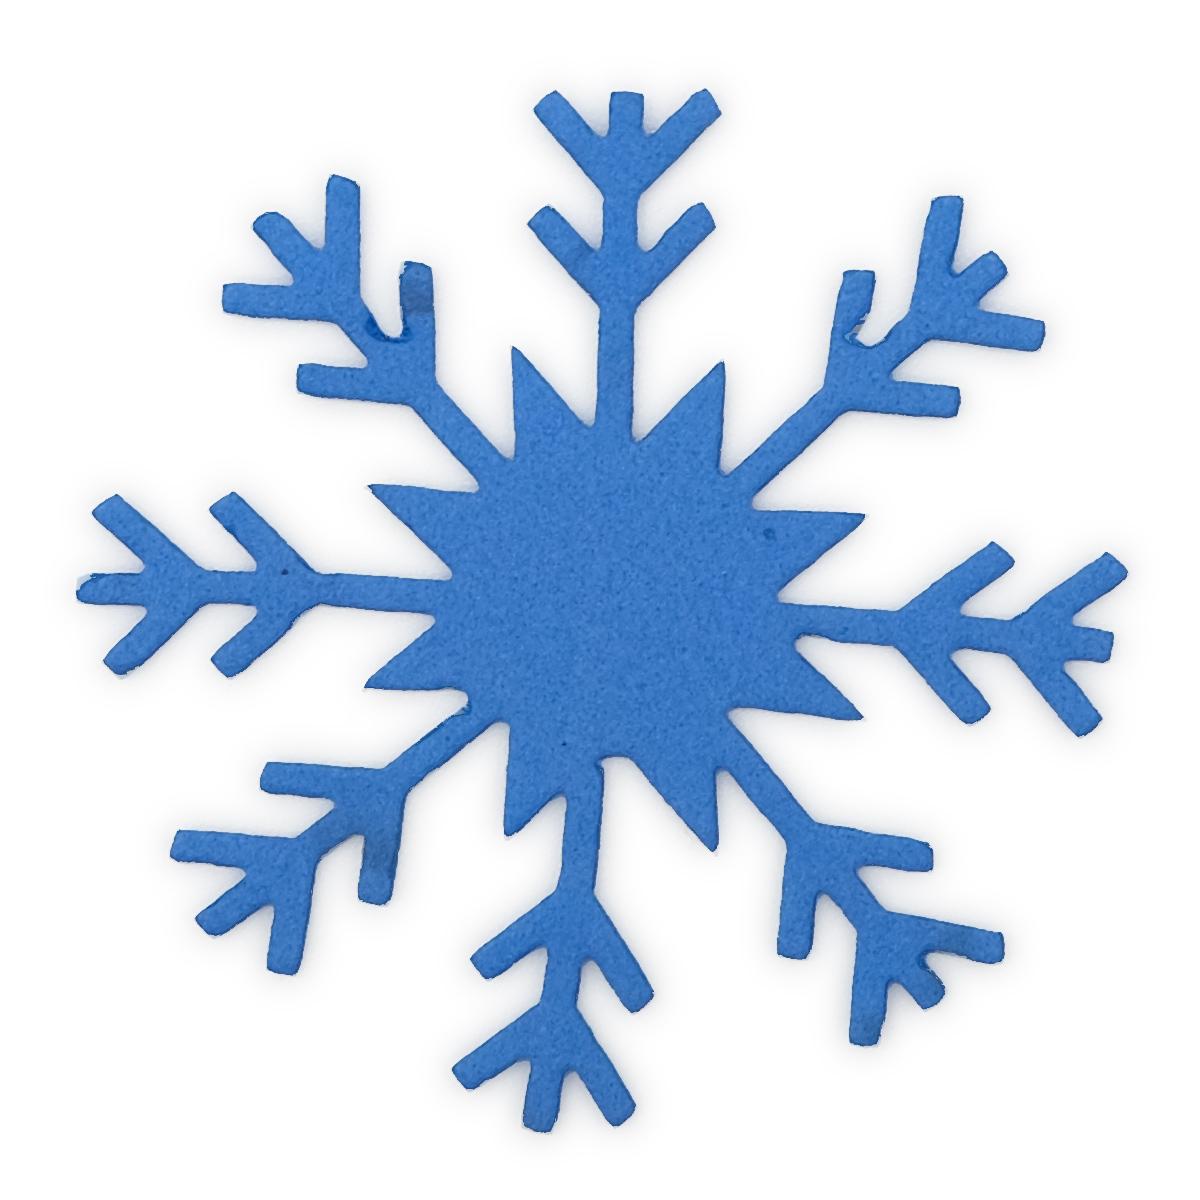 фом17-2 Заготовка из фоамирана 'Снежинка', 5х5 см,10шт